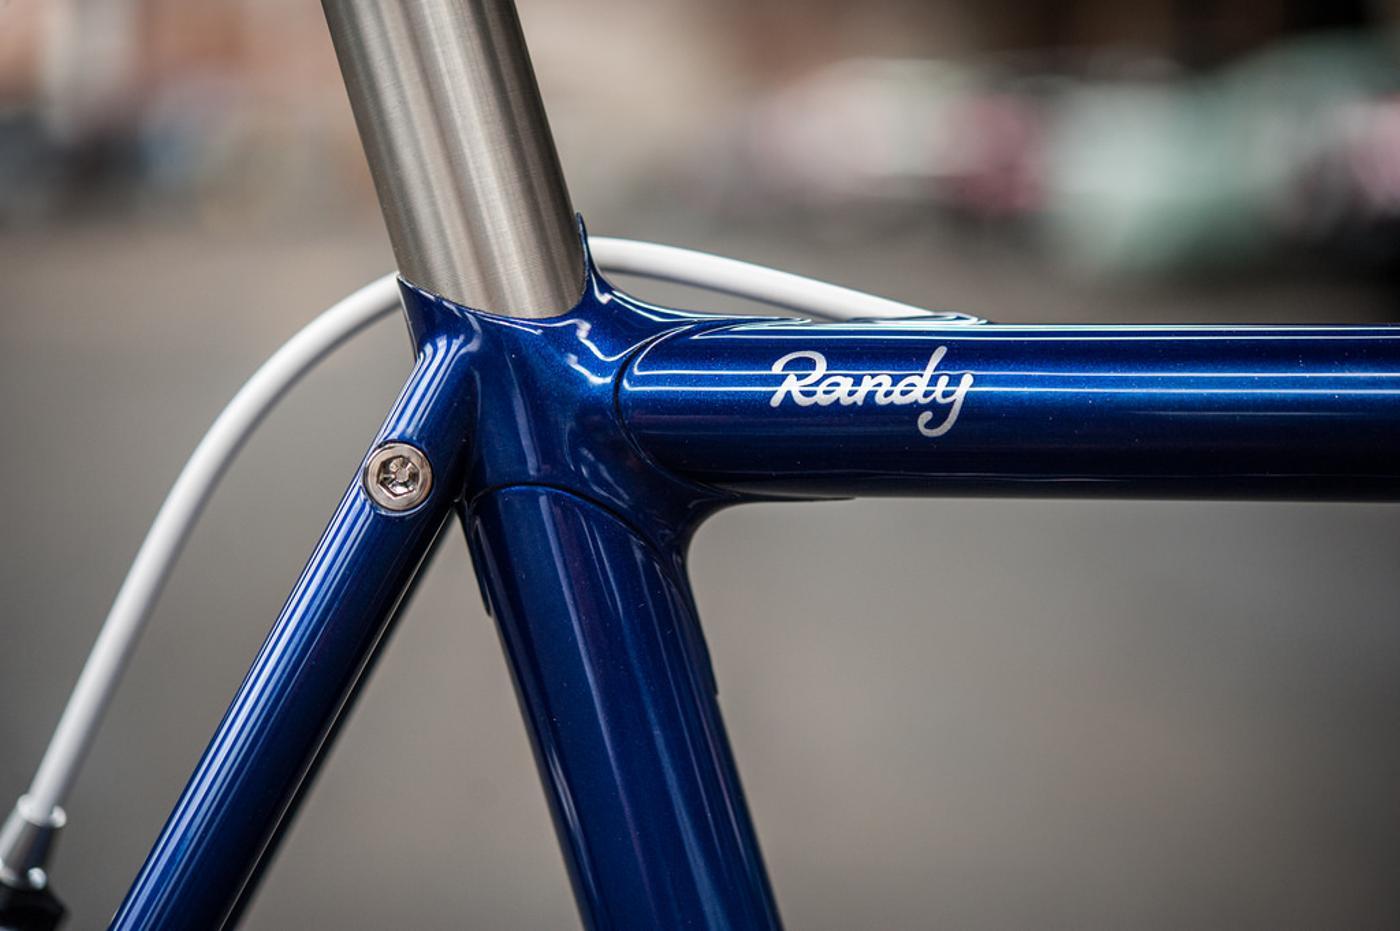 Randy-02